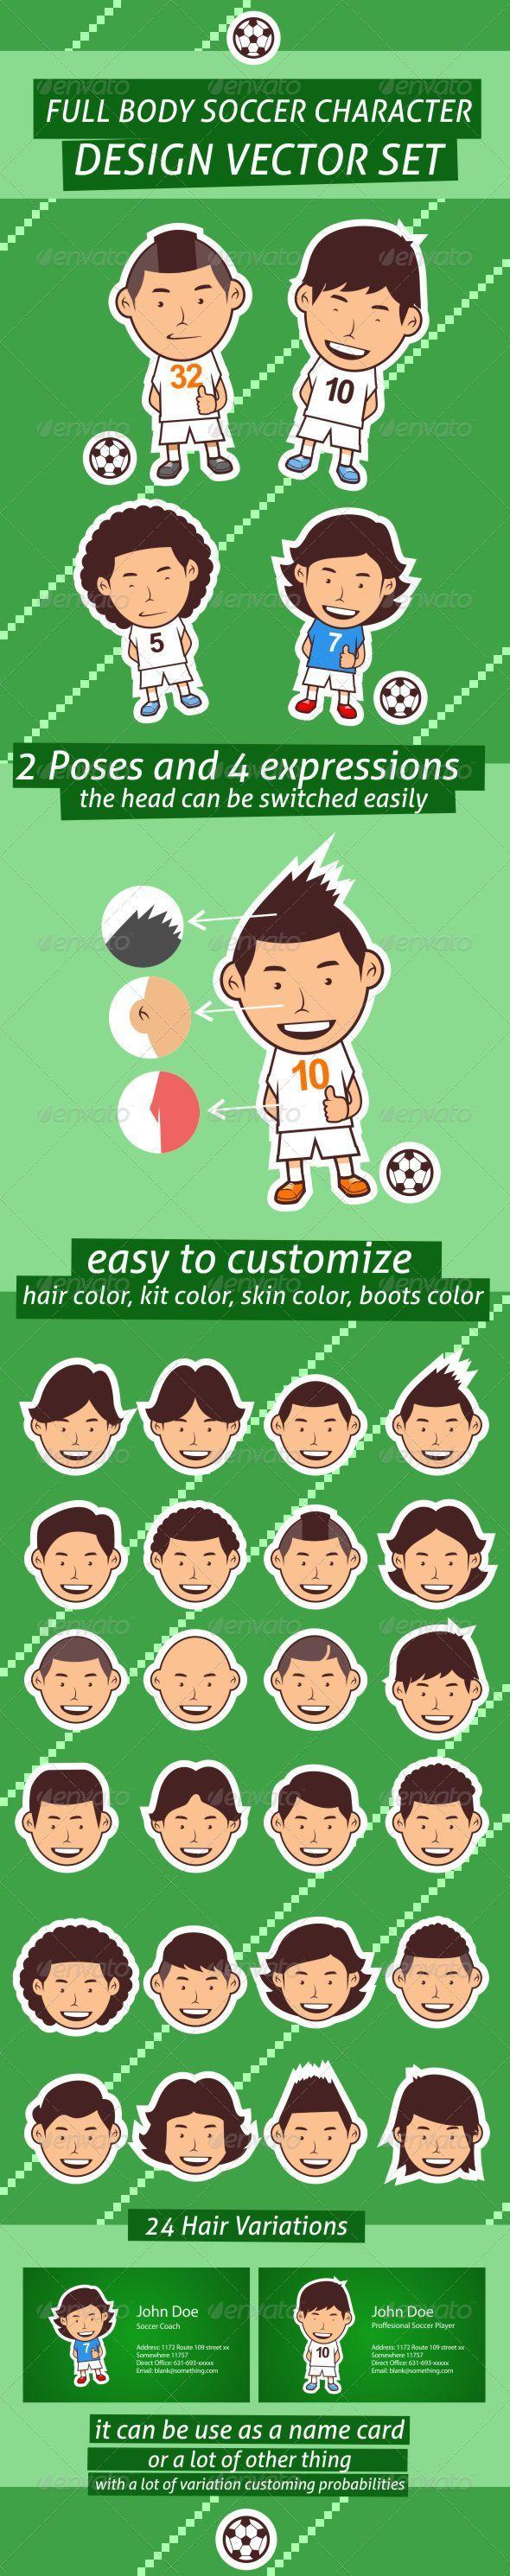 GraphicRiver Full Body Soccer Character Design Set 5747211